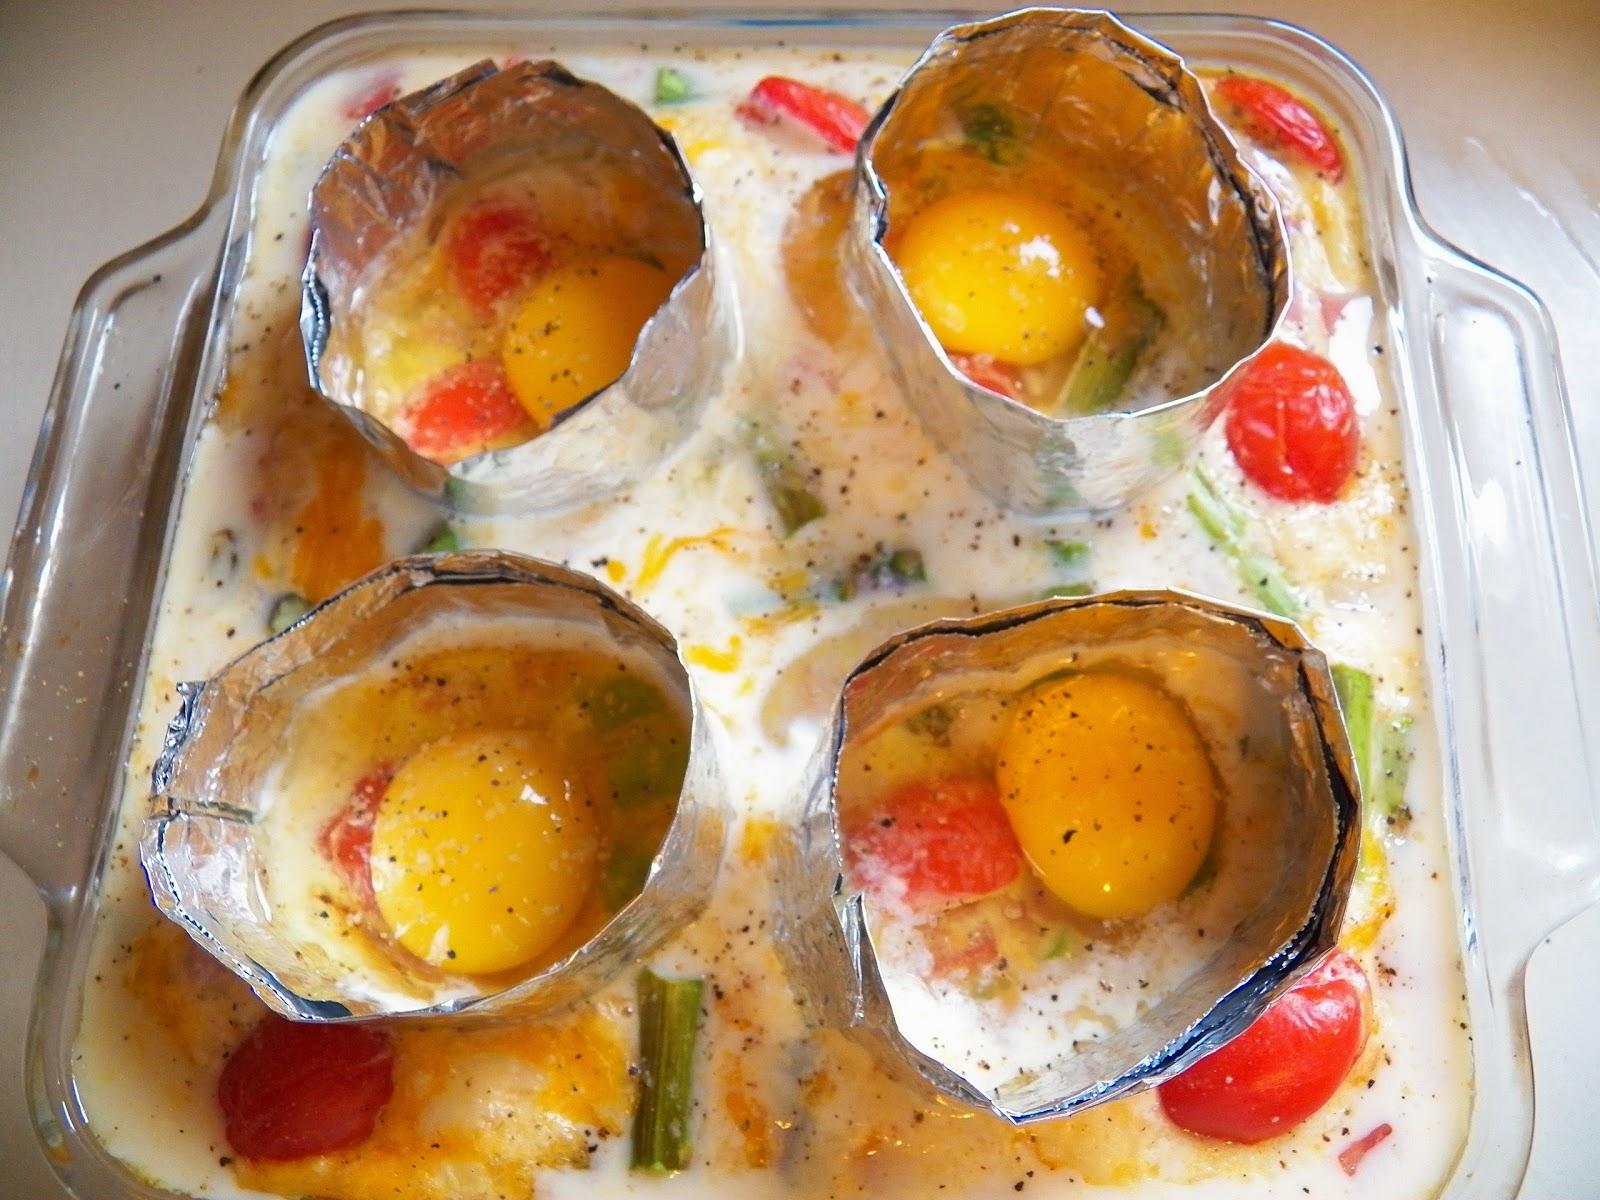 Egg Ham and Asparagus Breakfast Bake with aluminum foil rings